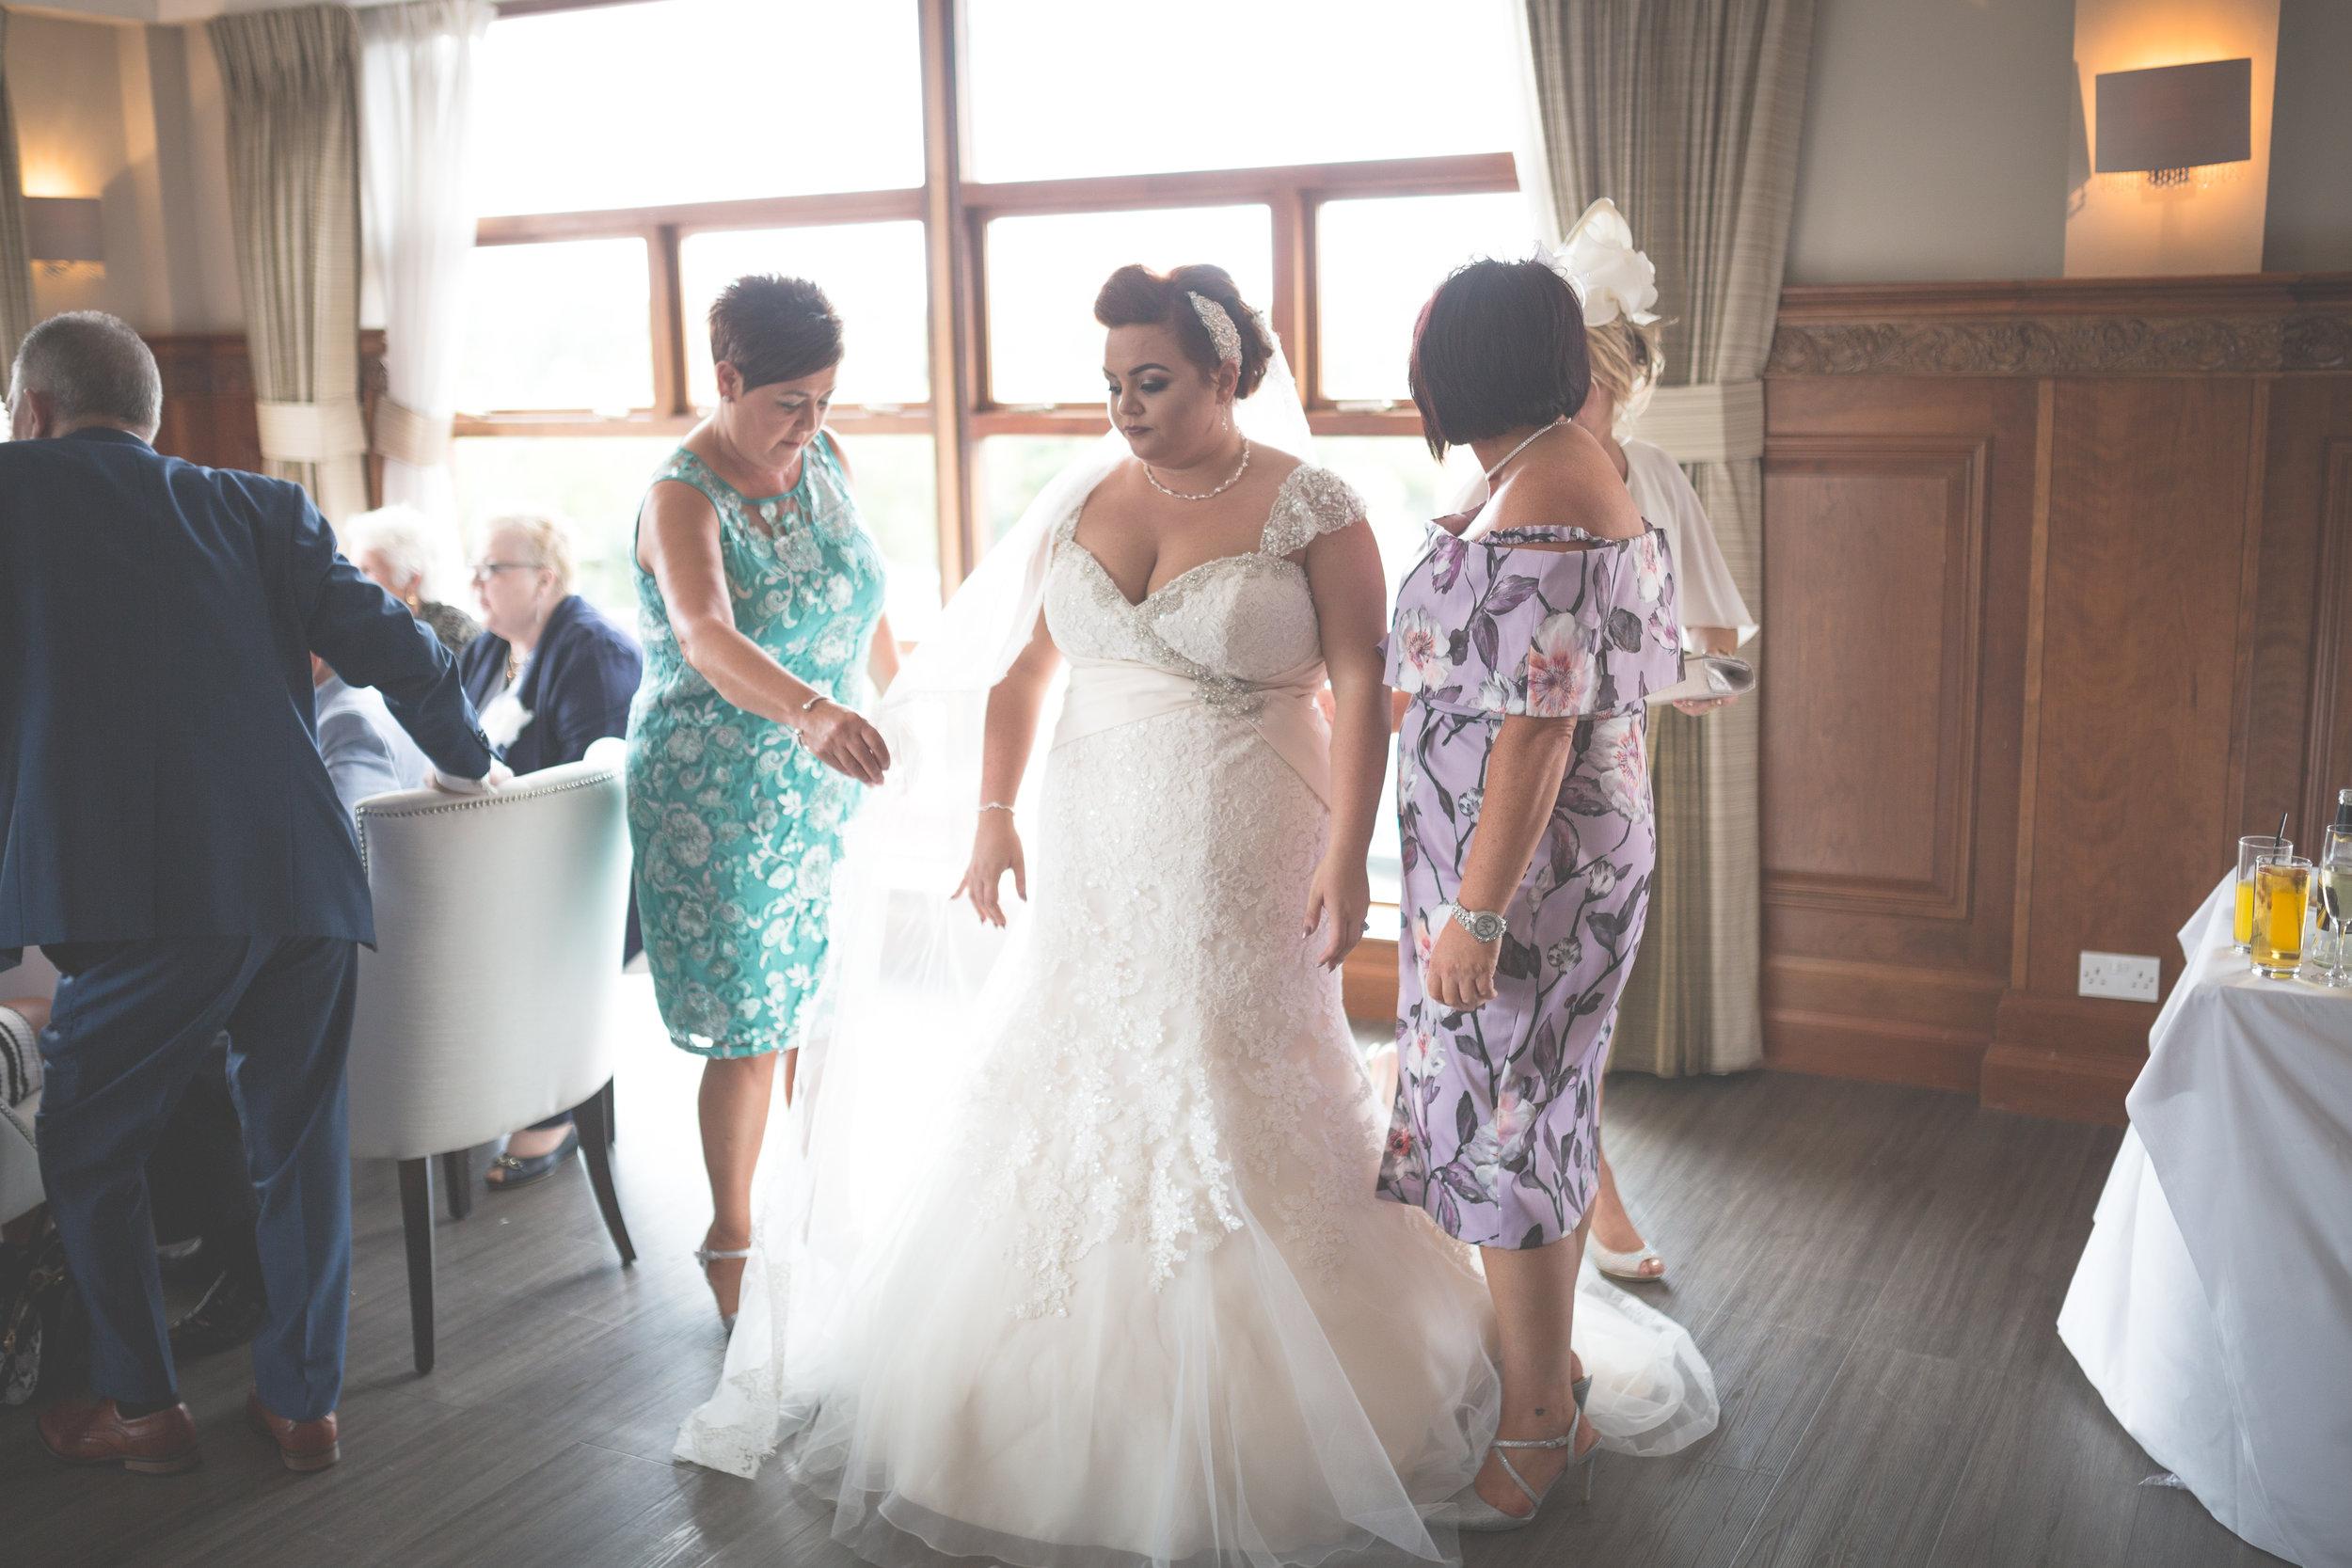 Antoinette & Stephen - Portraits | Brian McEwan Photography | Wedding Photographer Northern Ireland 110.jpg